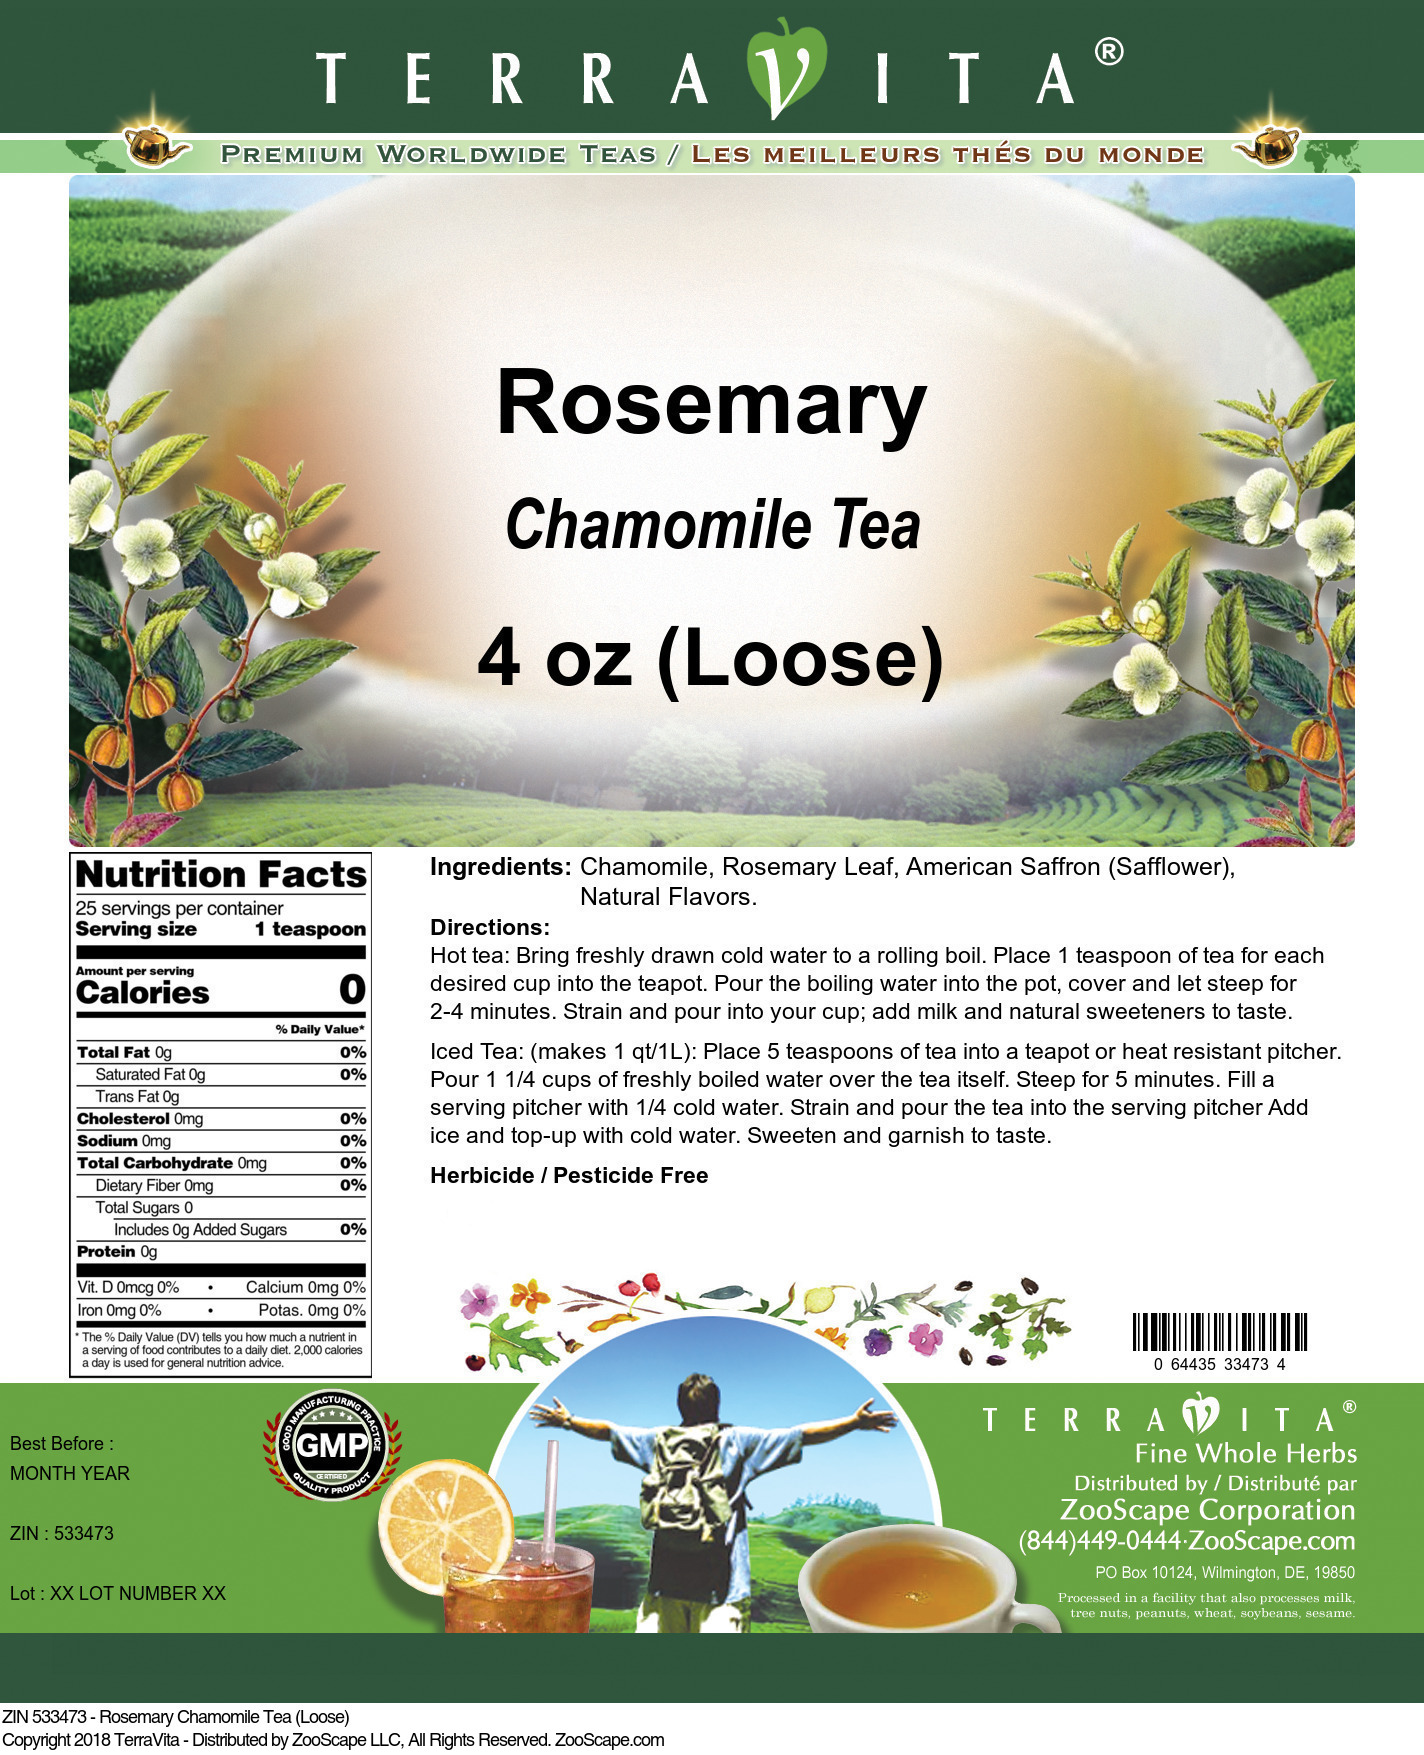 Rosemary Chamomile Tea (Loose)